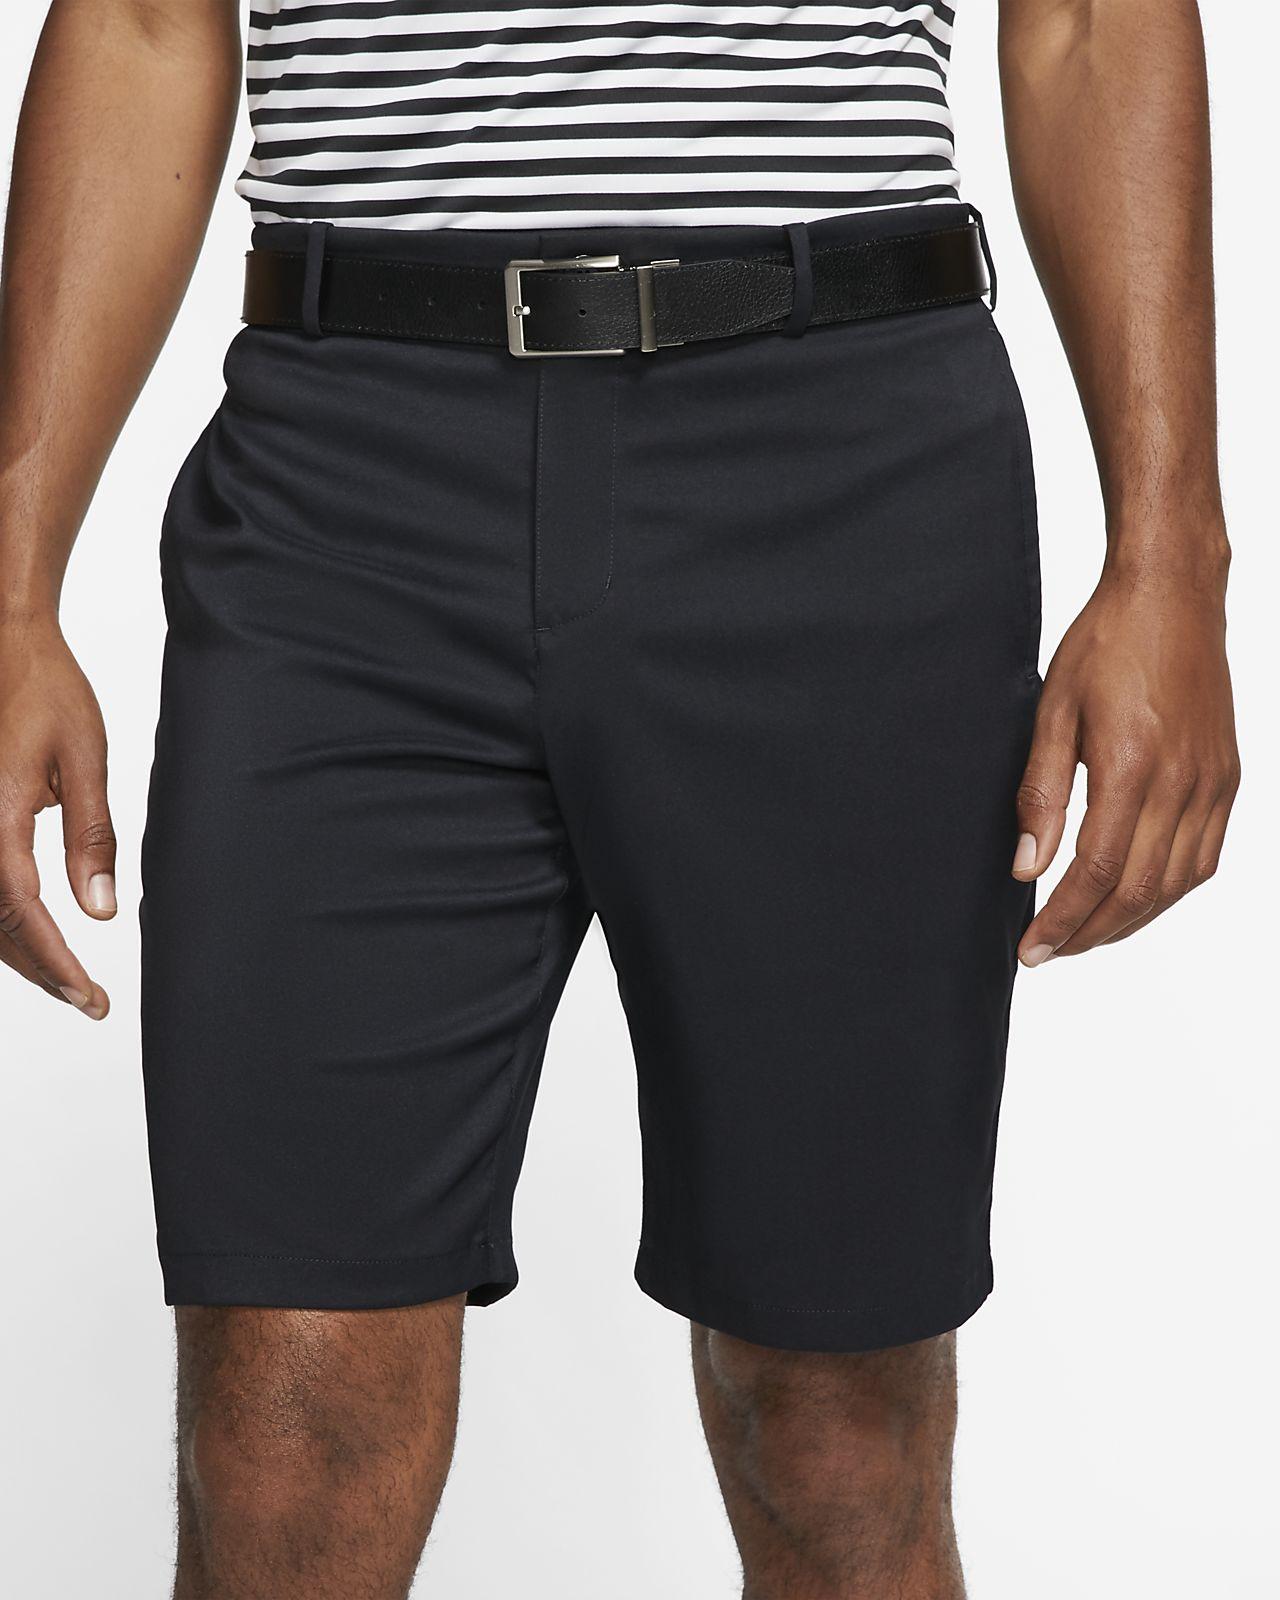 pantalon nike homme golf